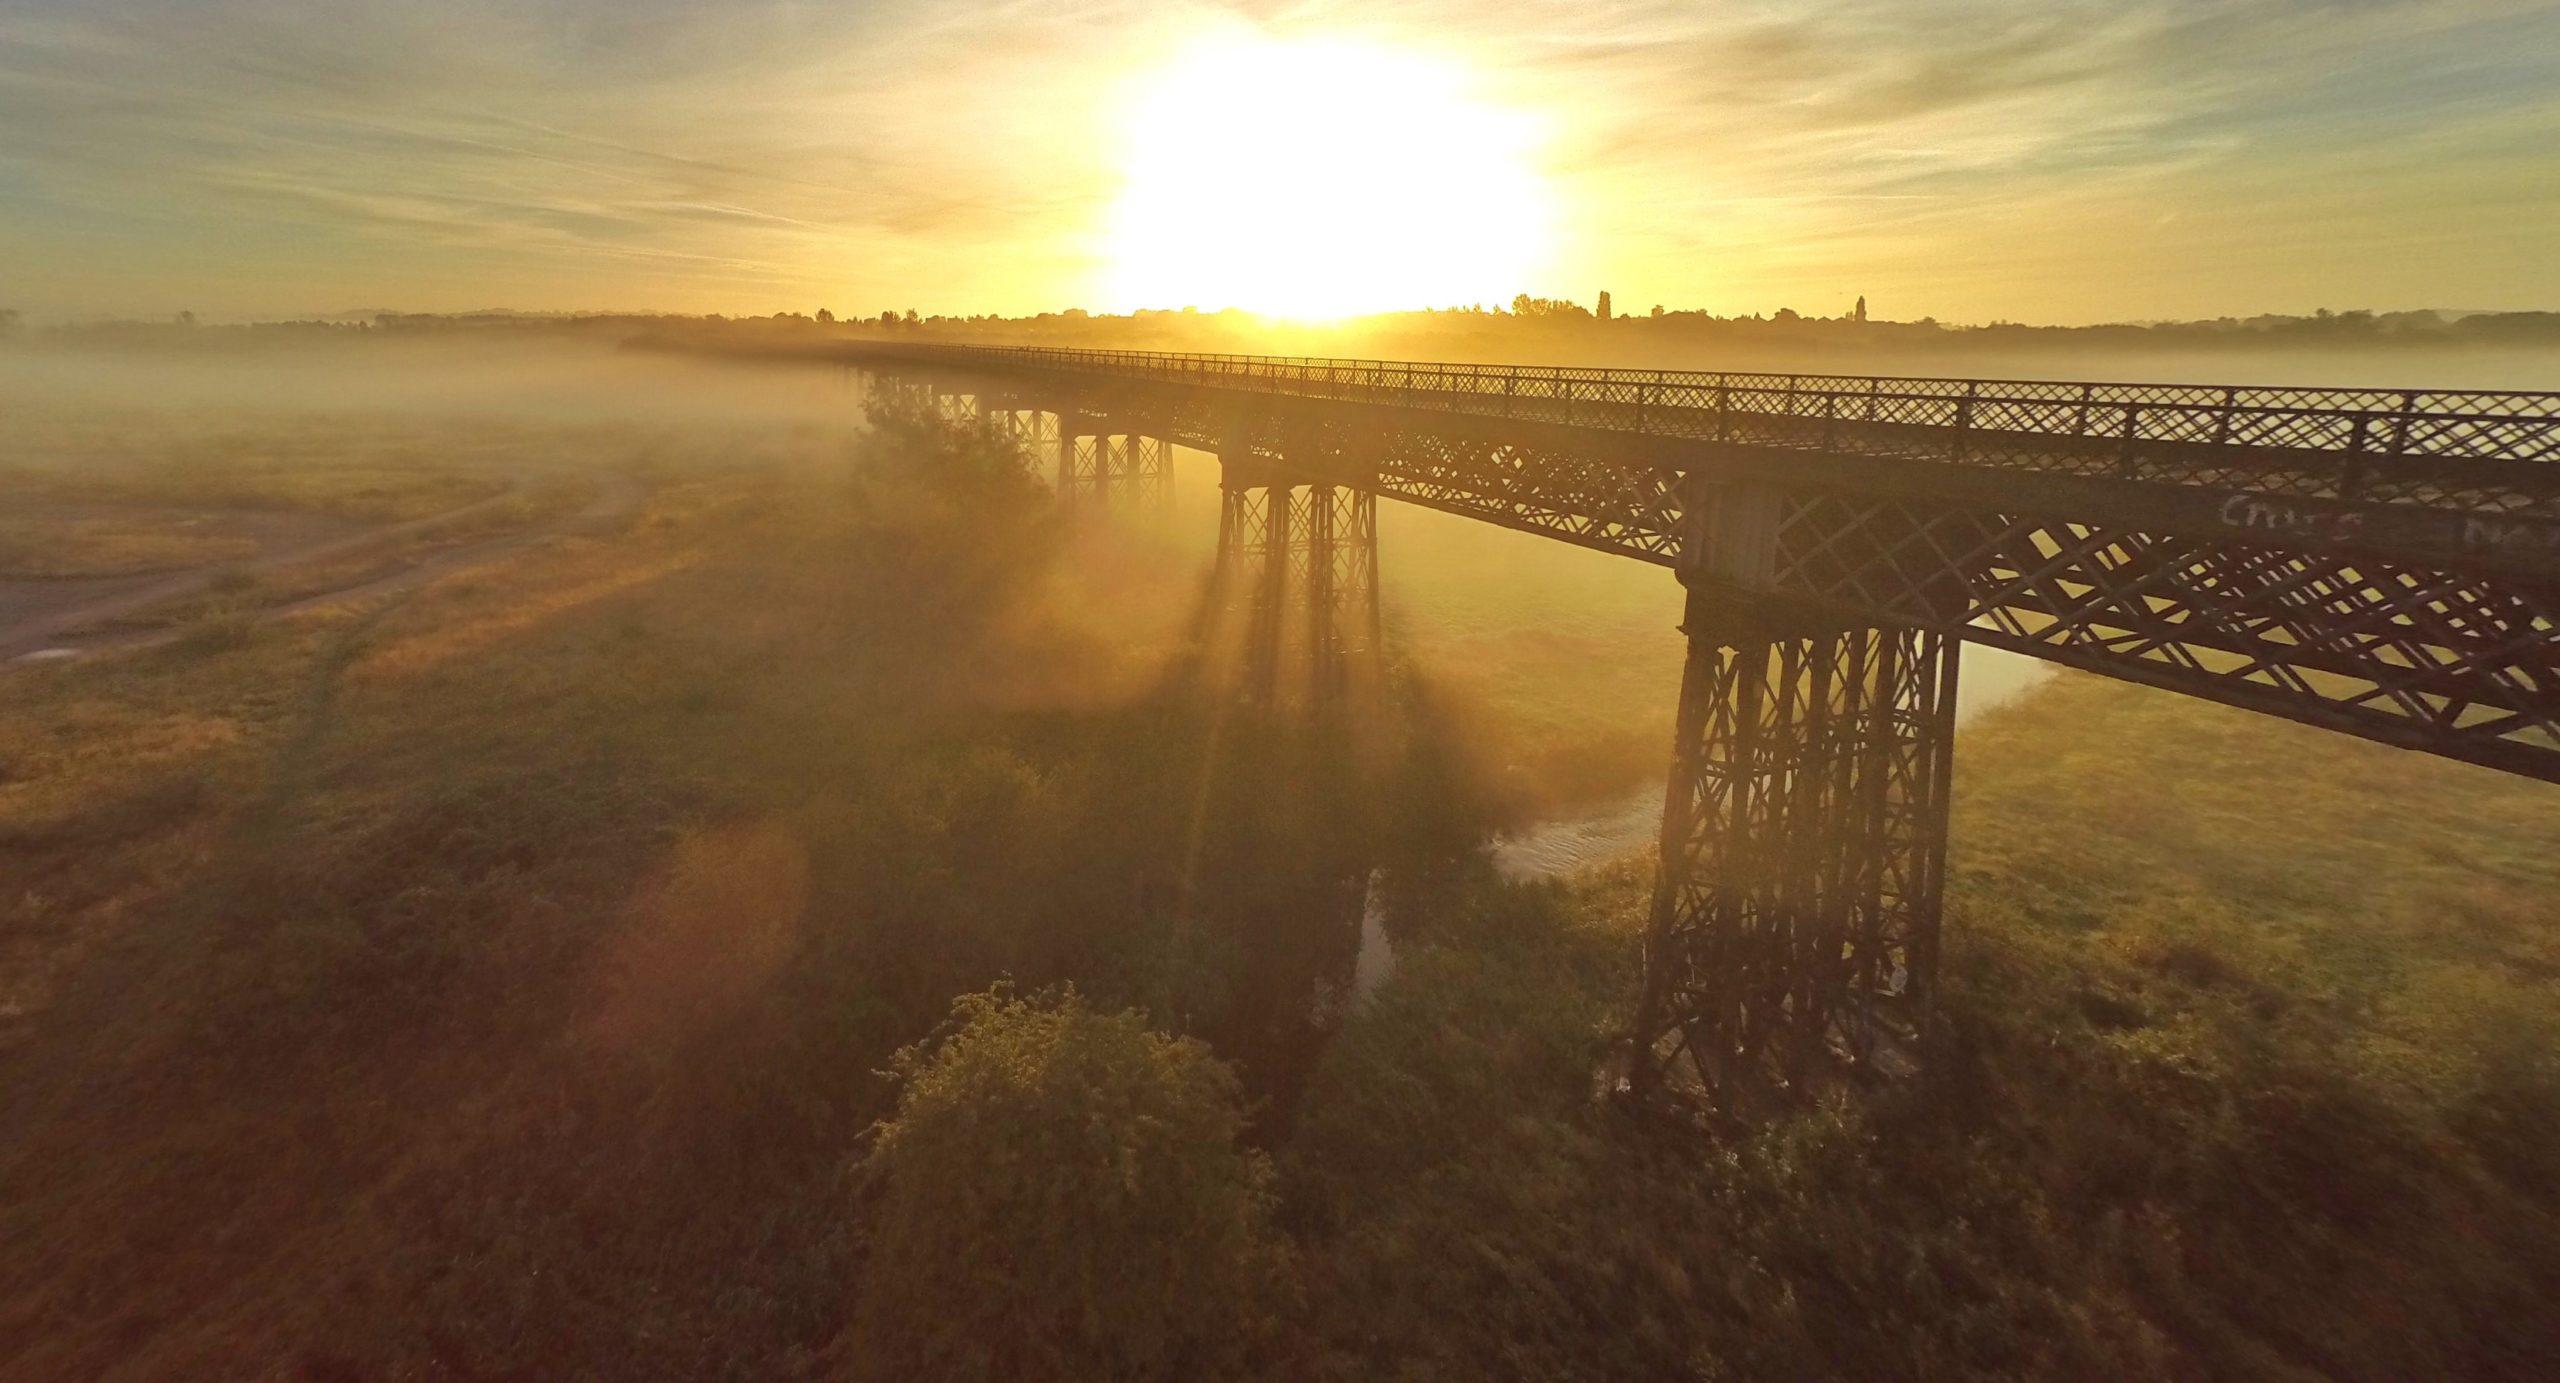 Bernnerley Viaduct